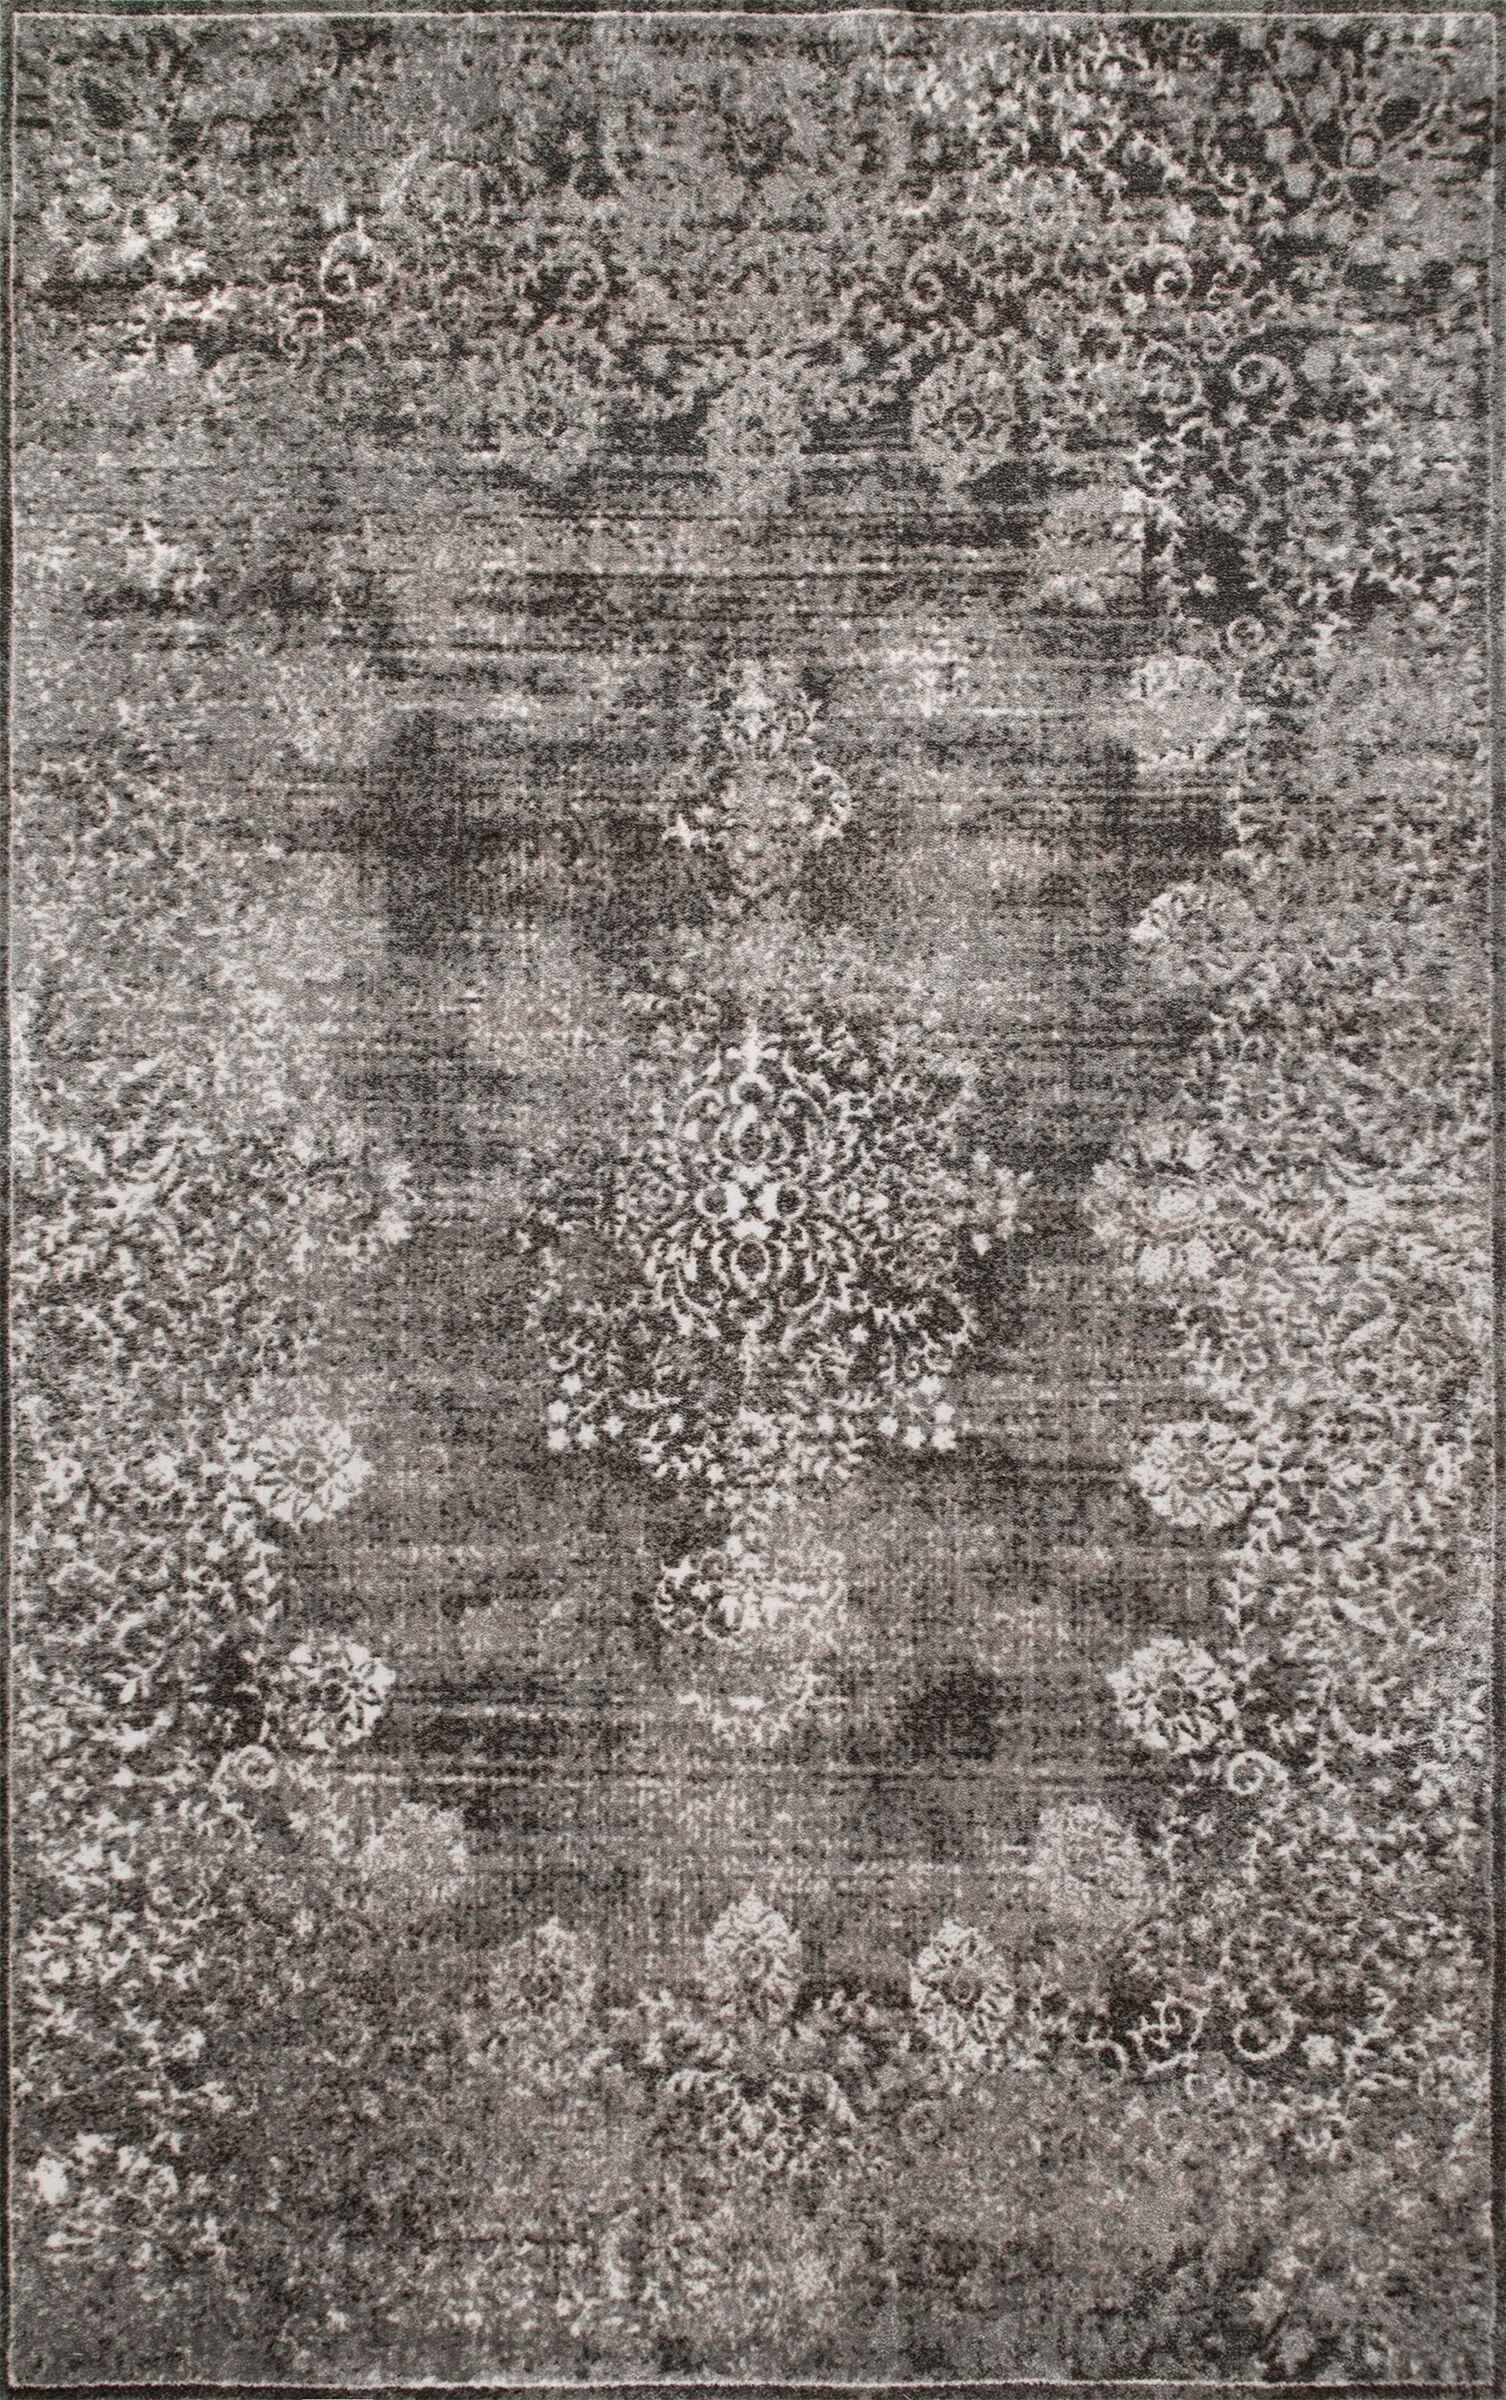 Paola Gray Area Rug Rug Size: Rectangle 4' x 6'